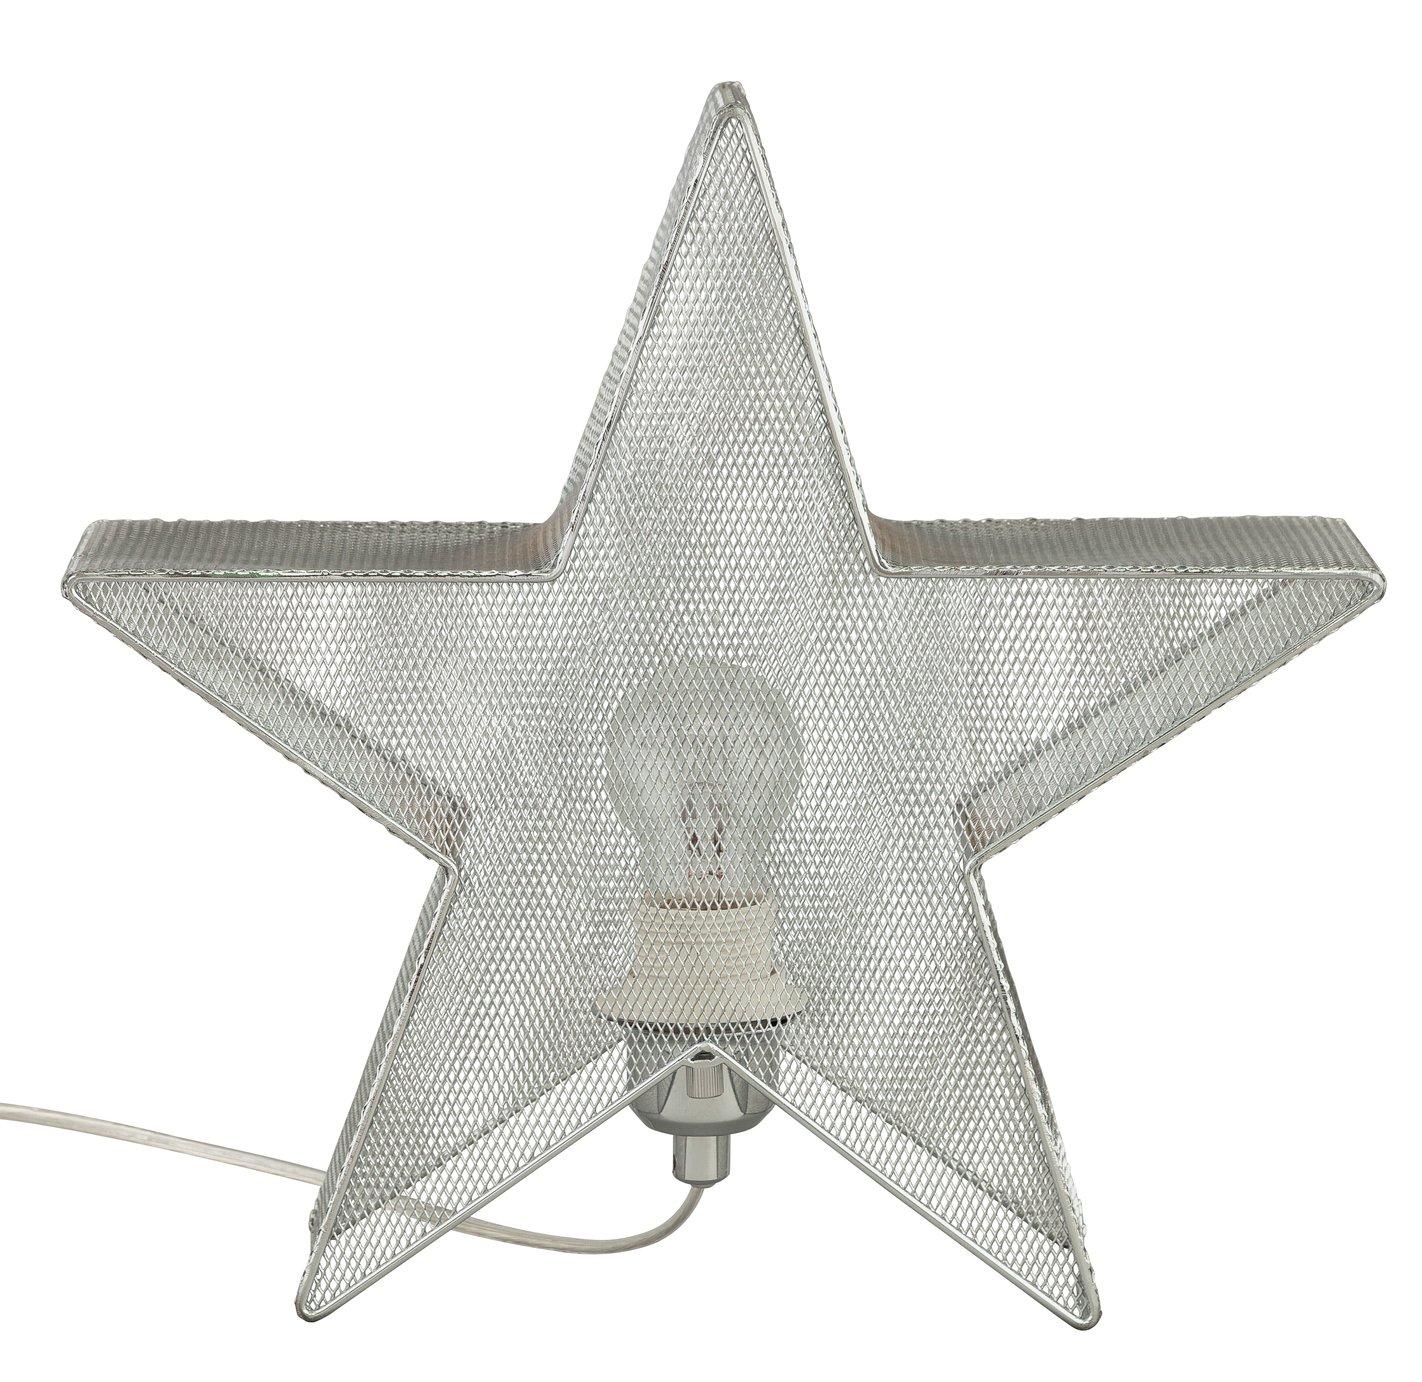 Argos Home Star Chrome Mesh Table Lamp - Silver